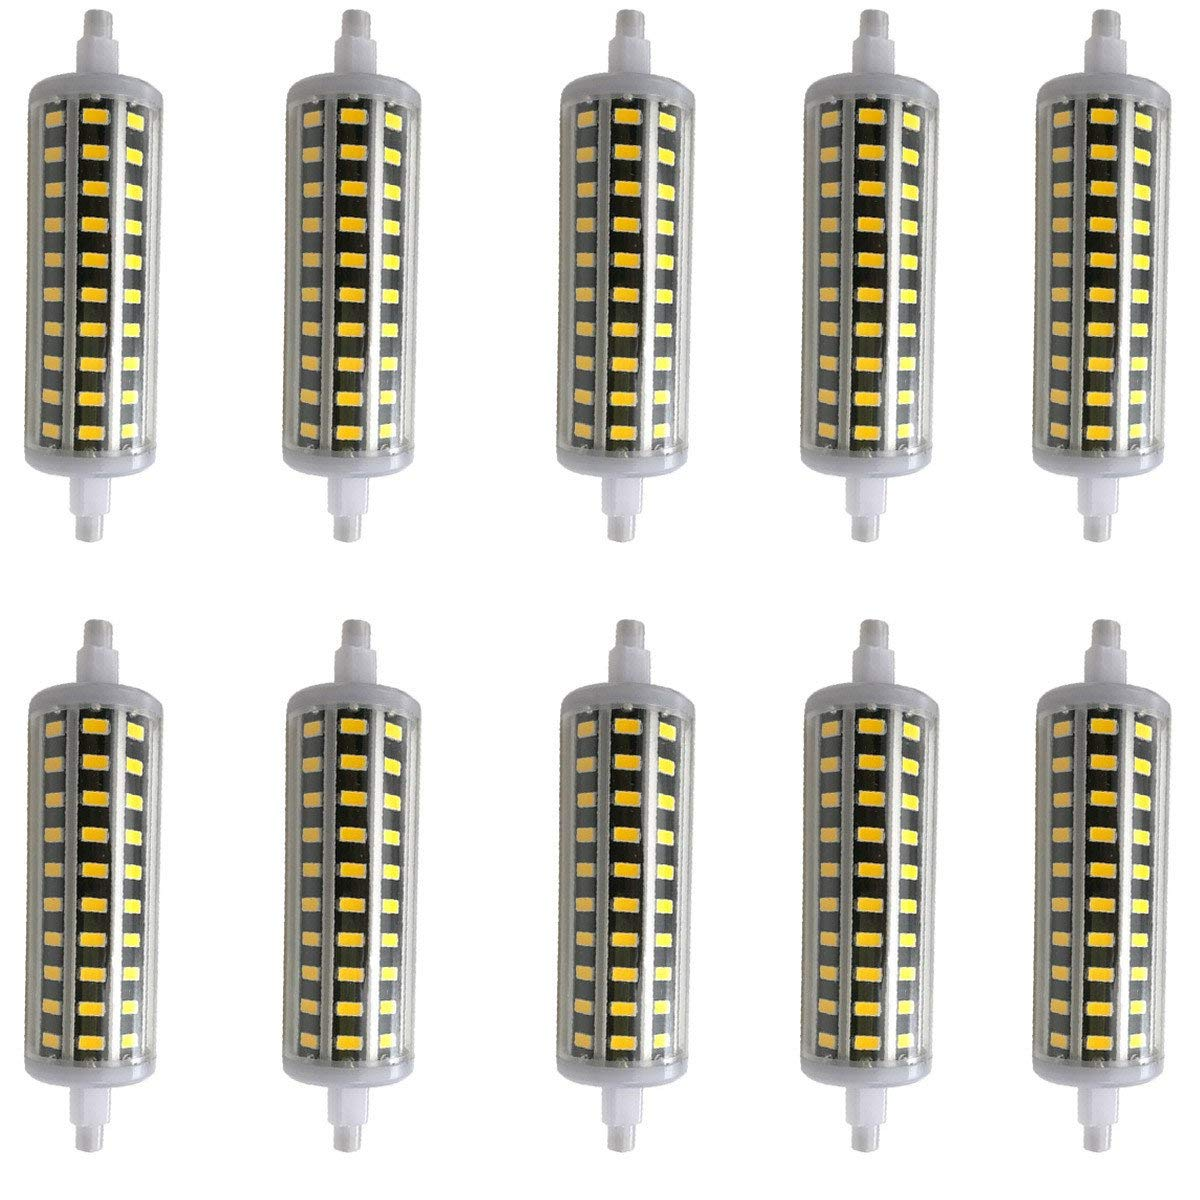 XXIONG Aoxdi 10X Dimmbar R7s LED 10 Watt 118mm, Warmweiß, SMD 5730 LED Leuchtmittel Lampe Halogen j118 Fluter Brenner Scheinwerfer Flutlicht, AC85-265V